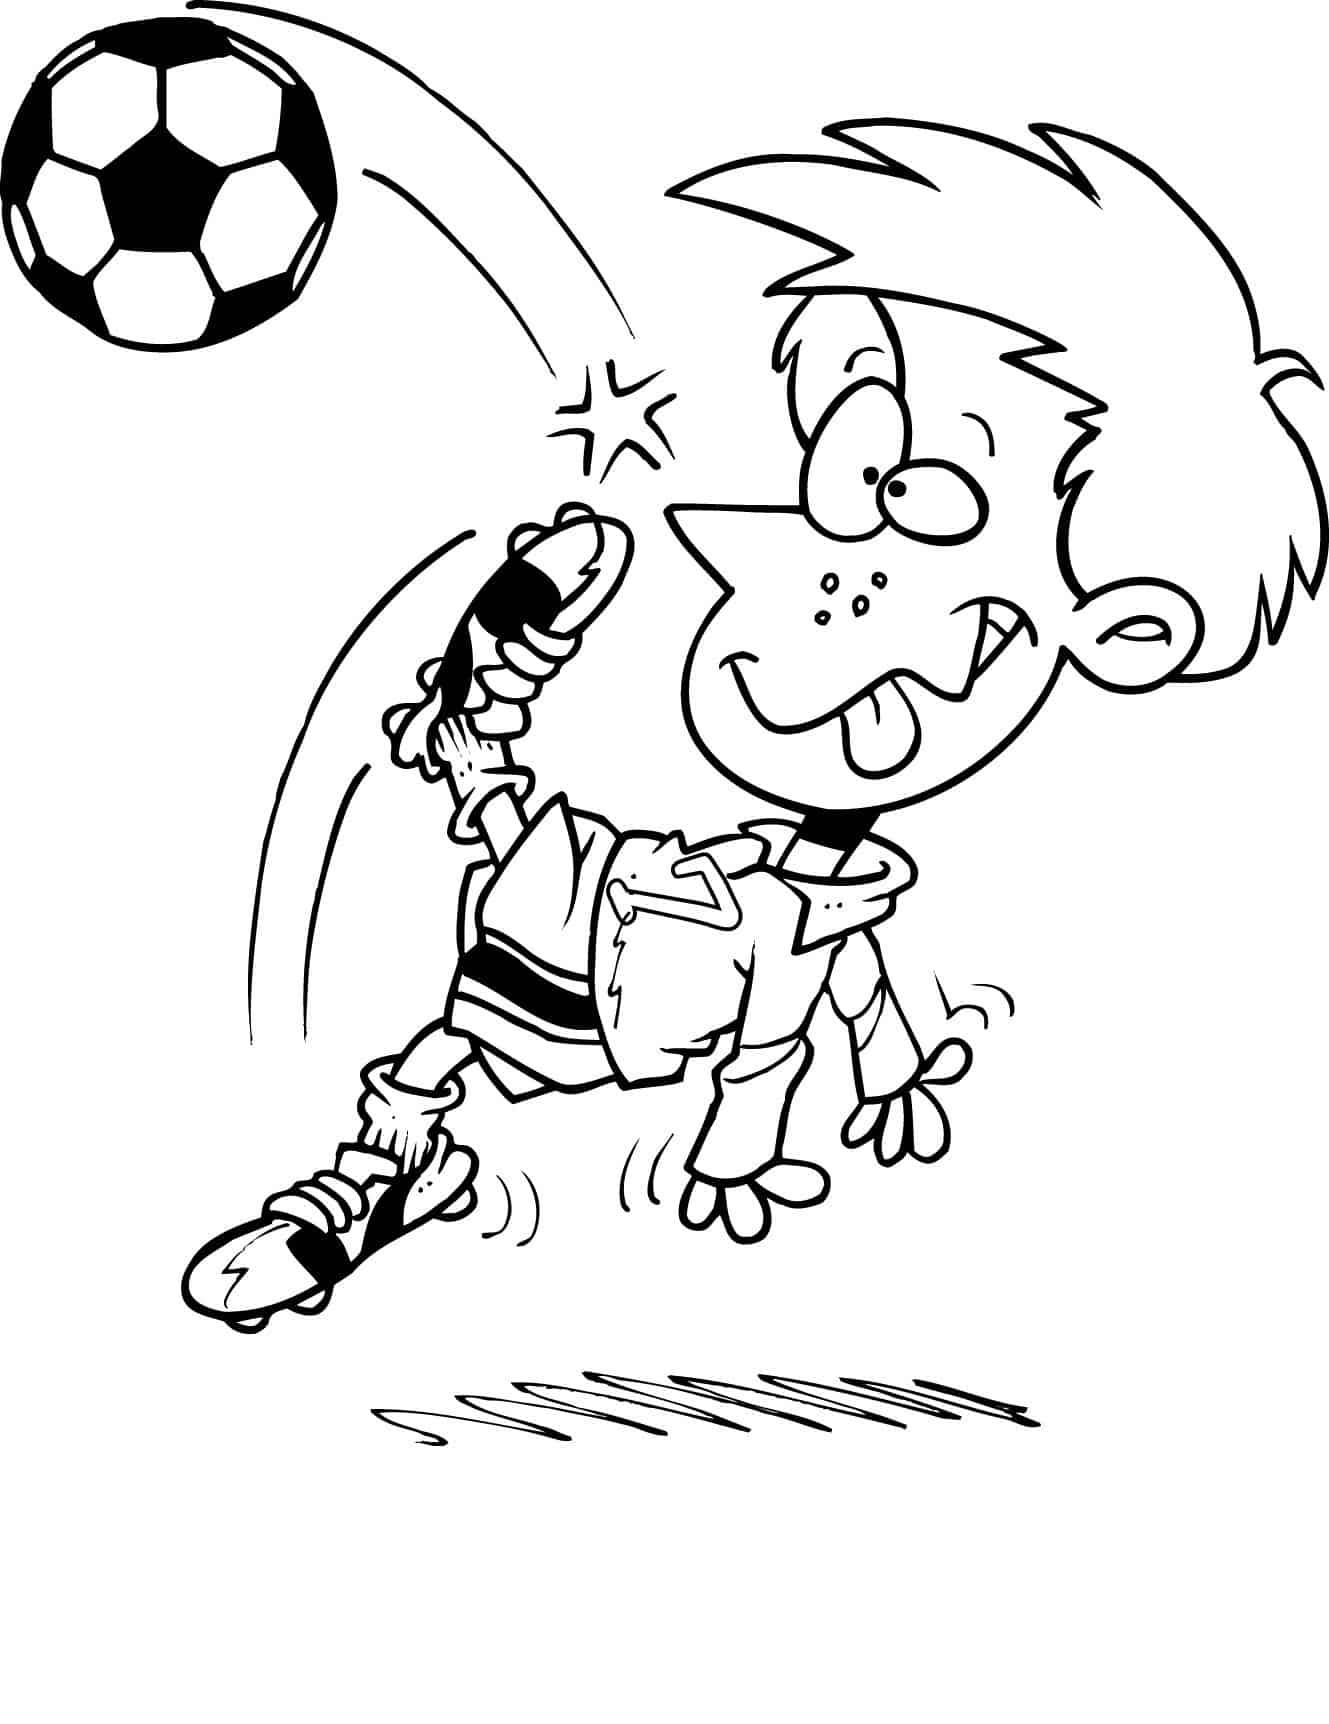 5 Fun Football Soccer Kids Printables